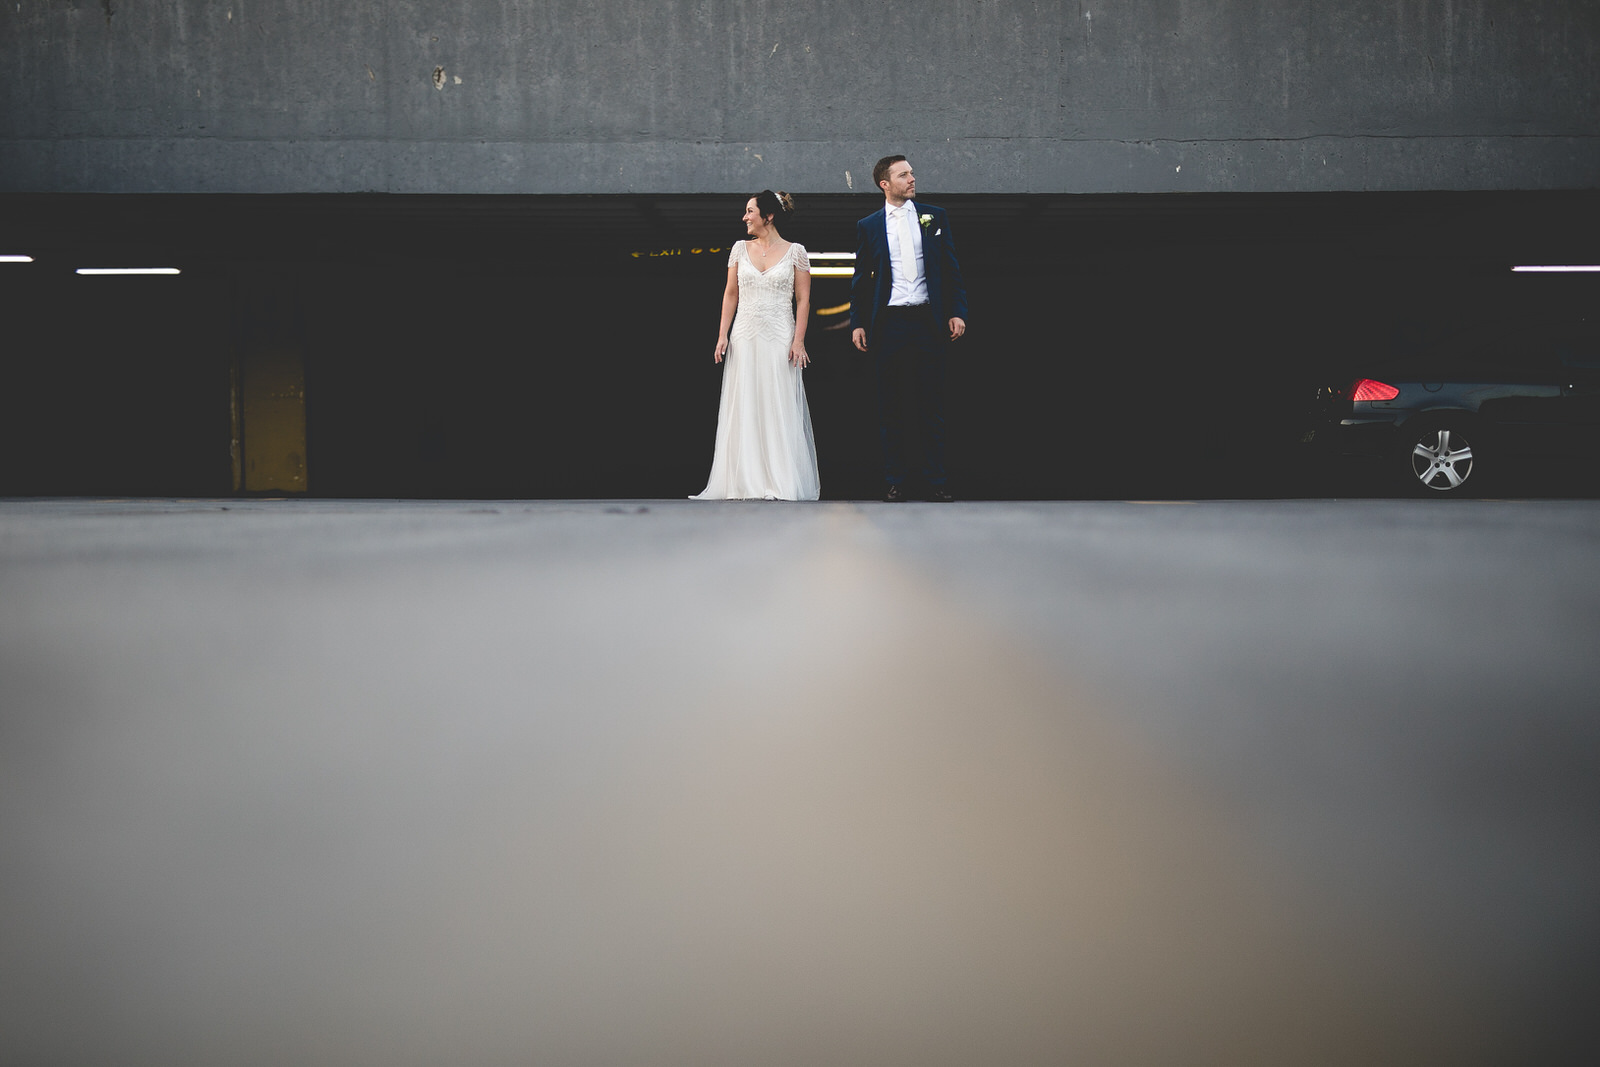 wedding photos in drury street car park roof